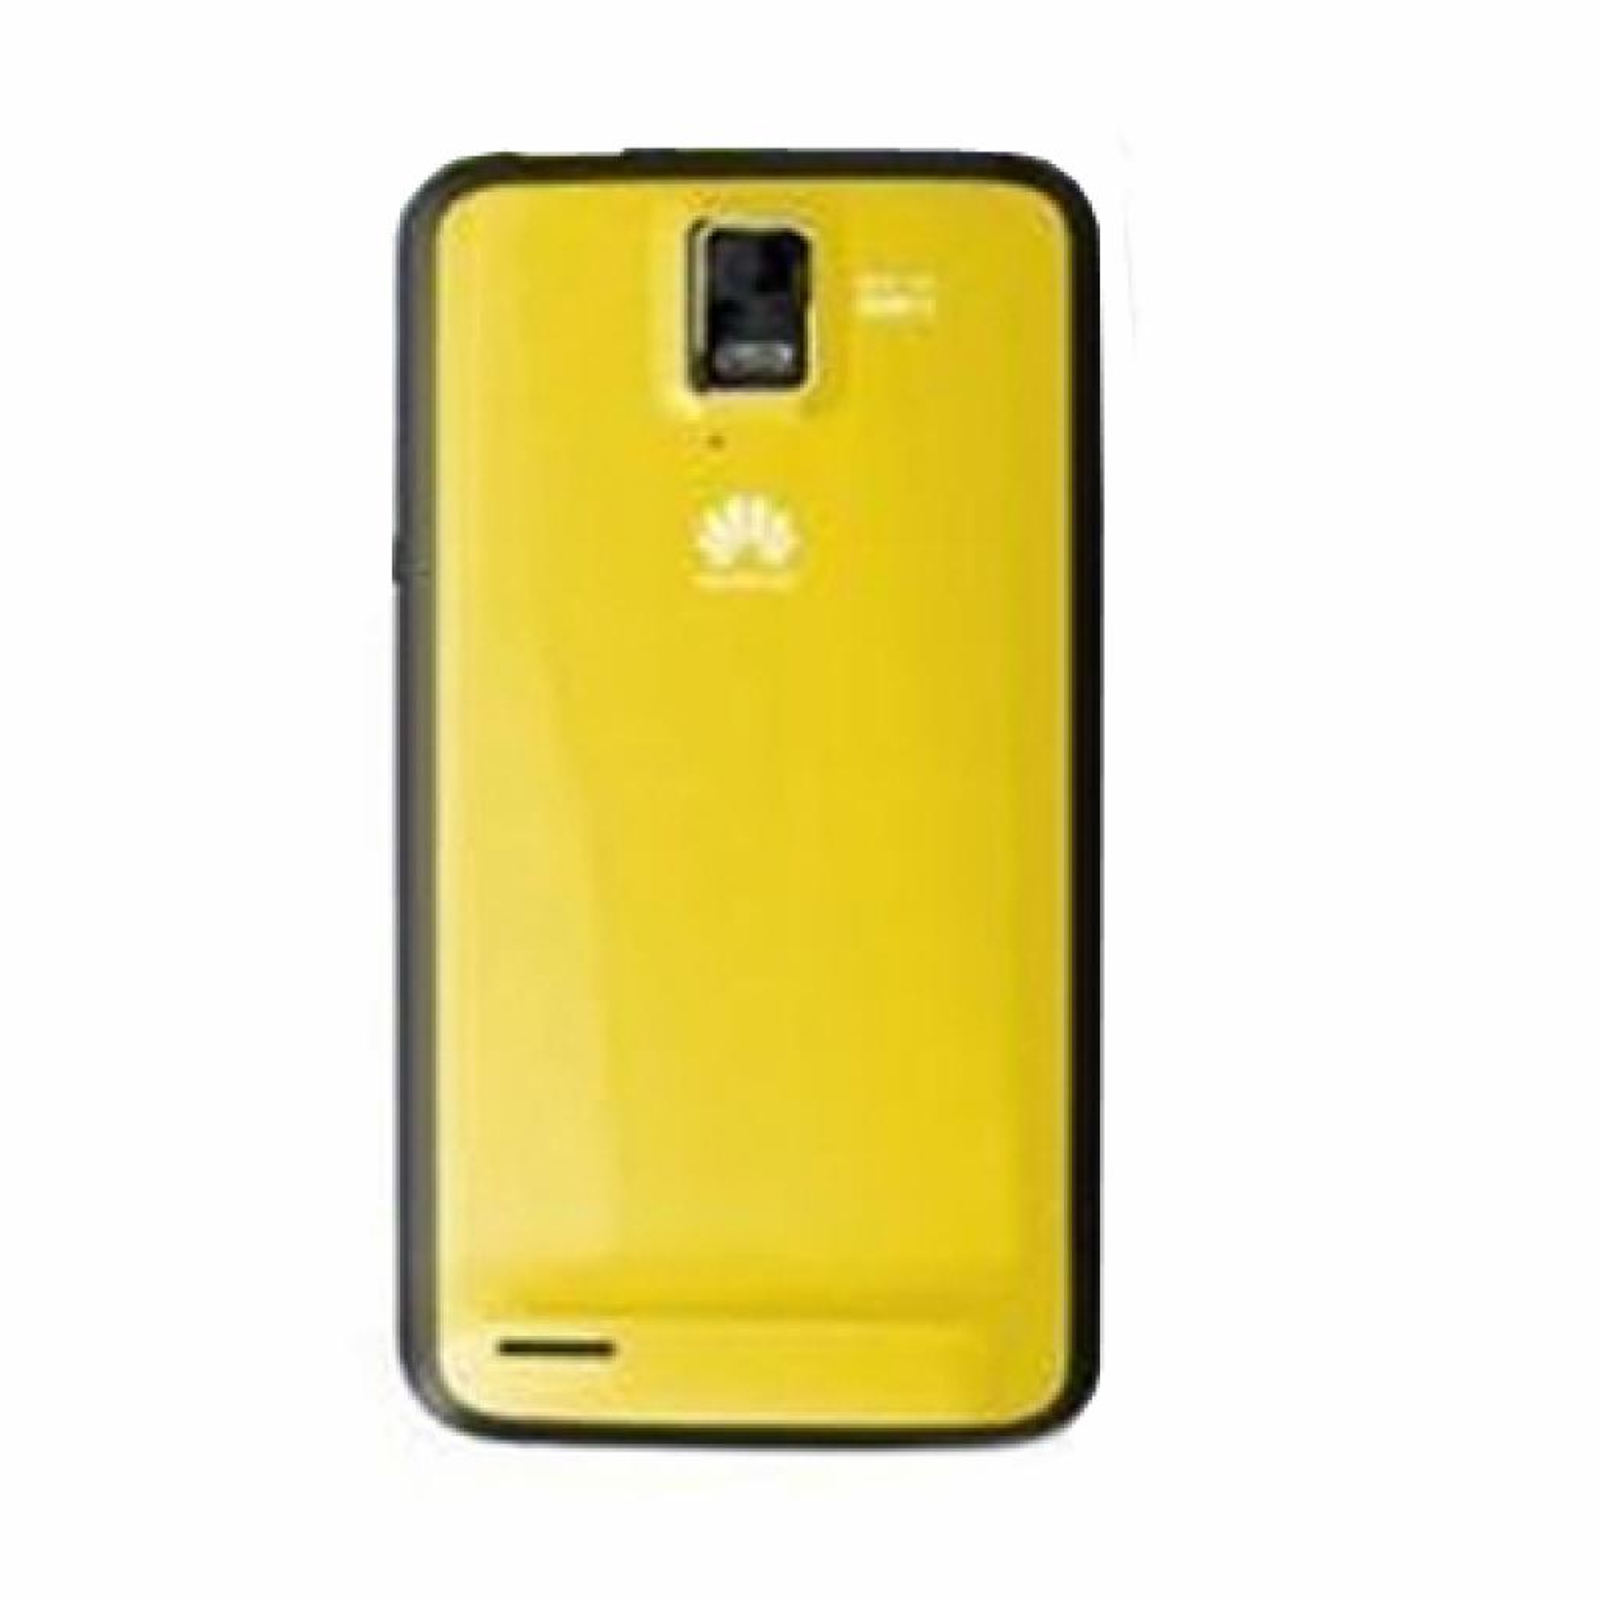 Чехол для моб. телефона Huawei Ascend D1 Flexible Protective Cover (51990293) изображение 2